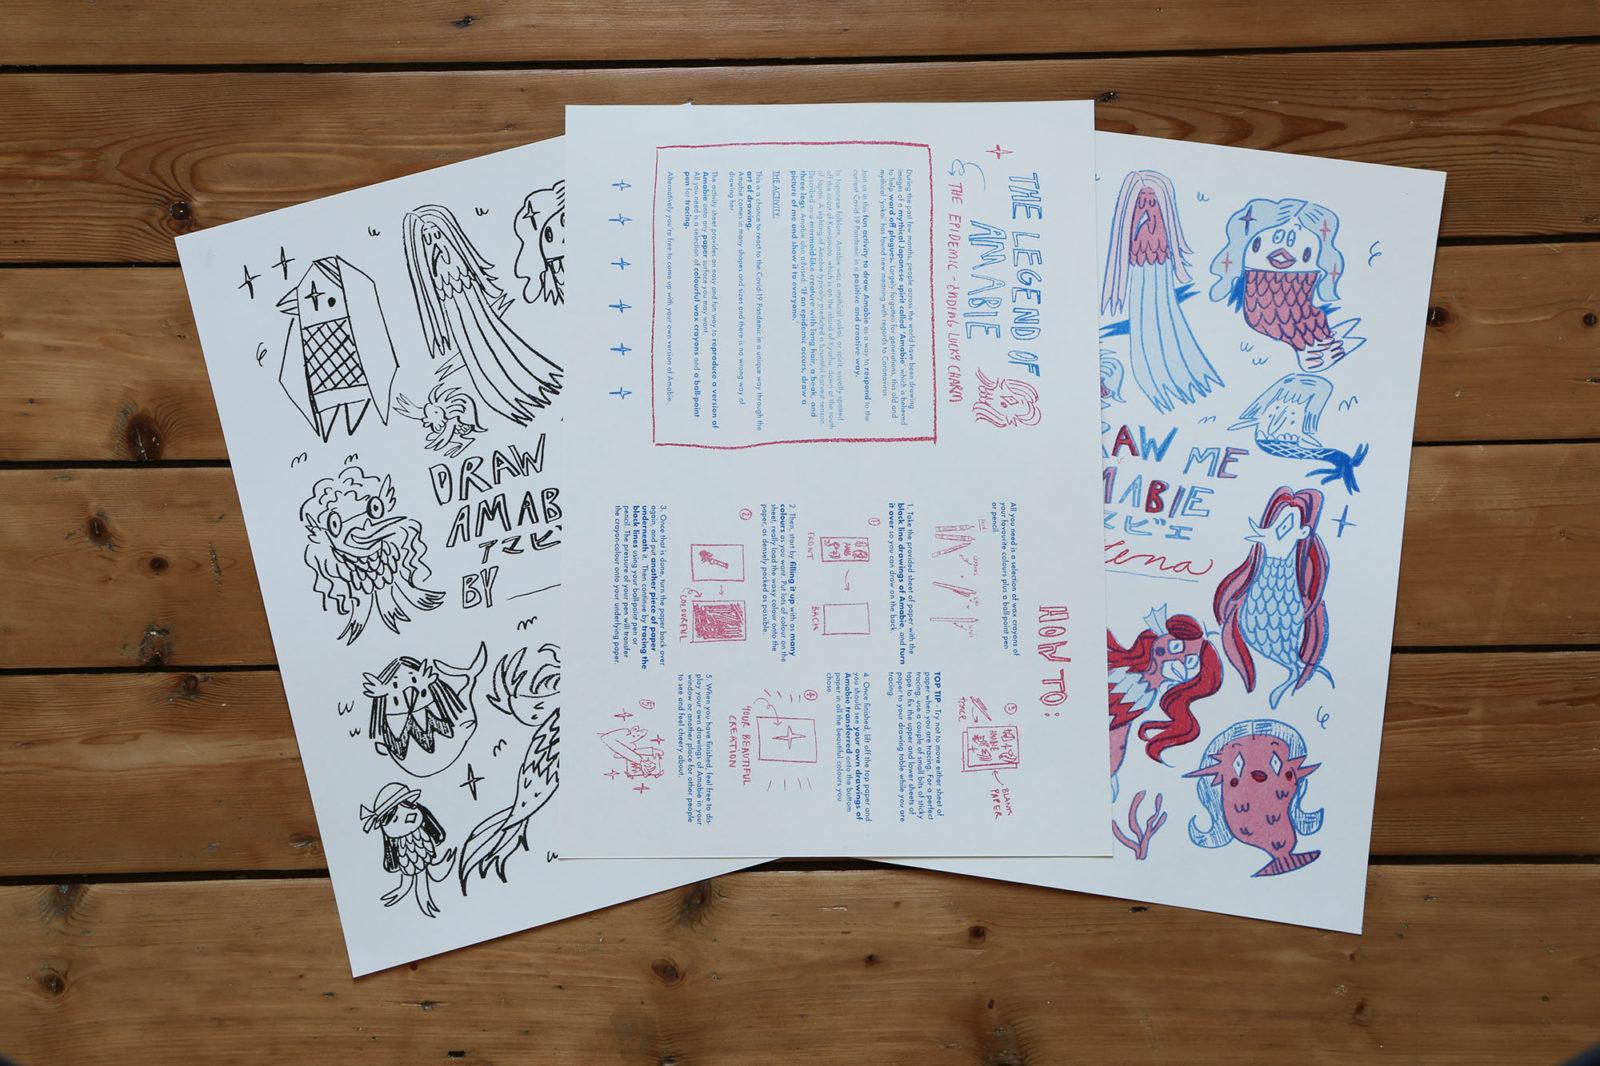 Pack No. 11 by Lena Yokoyama